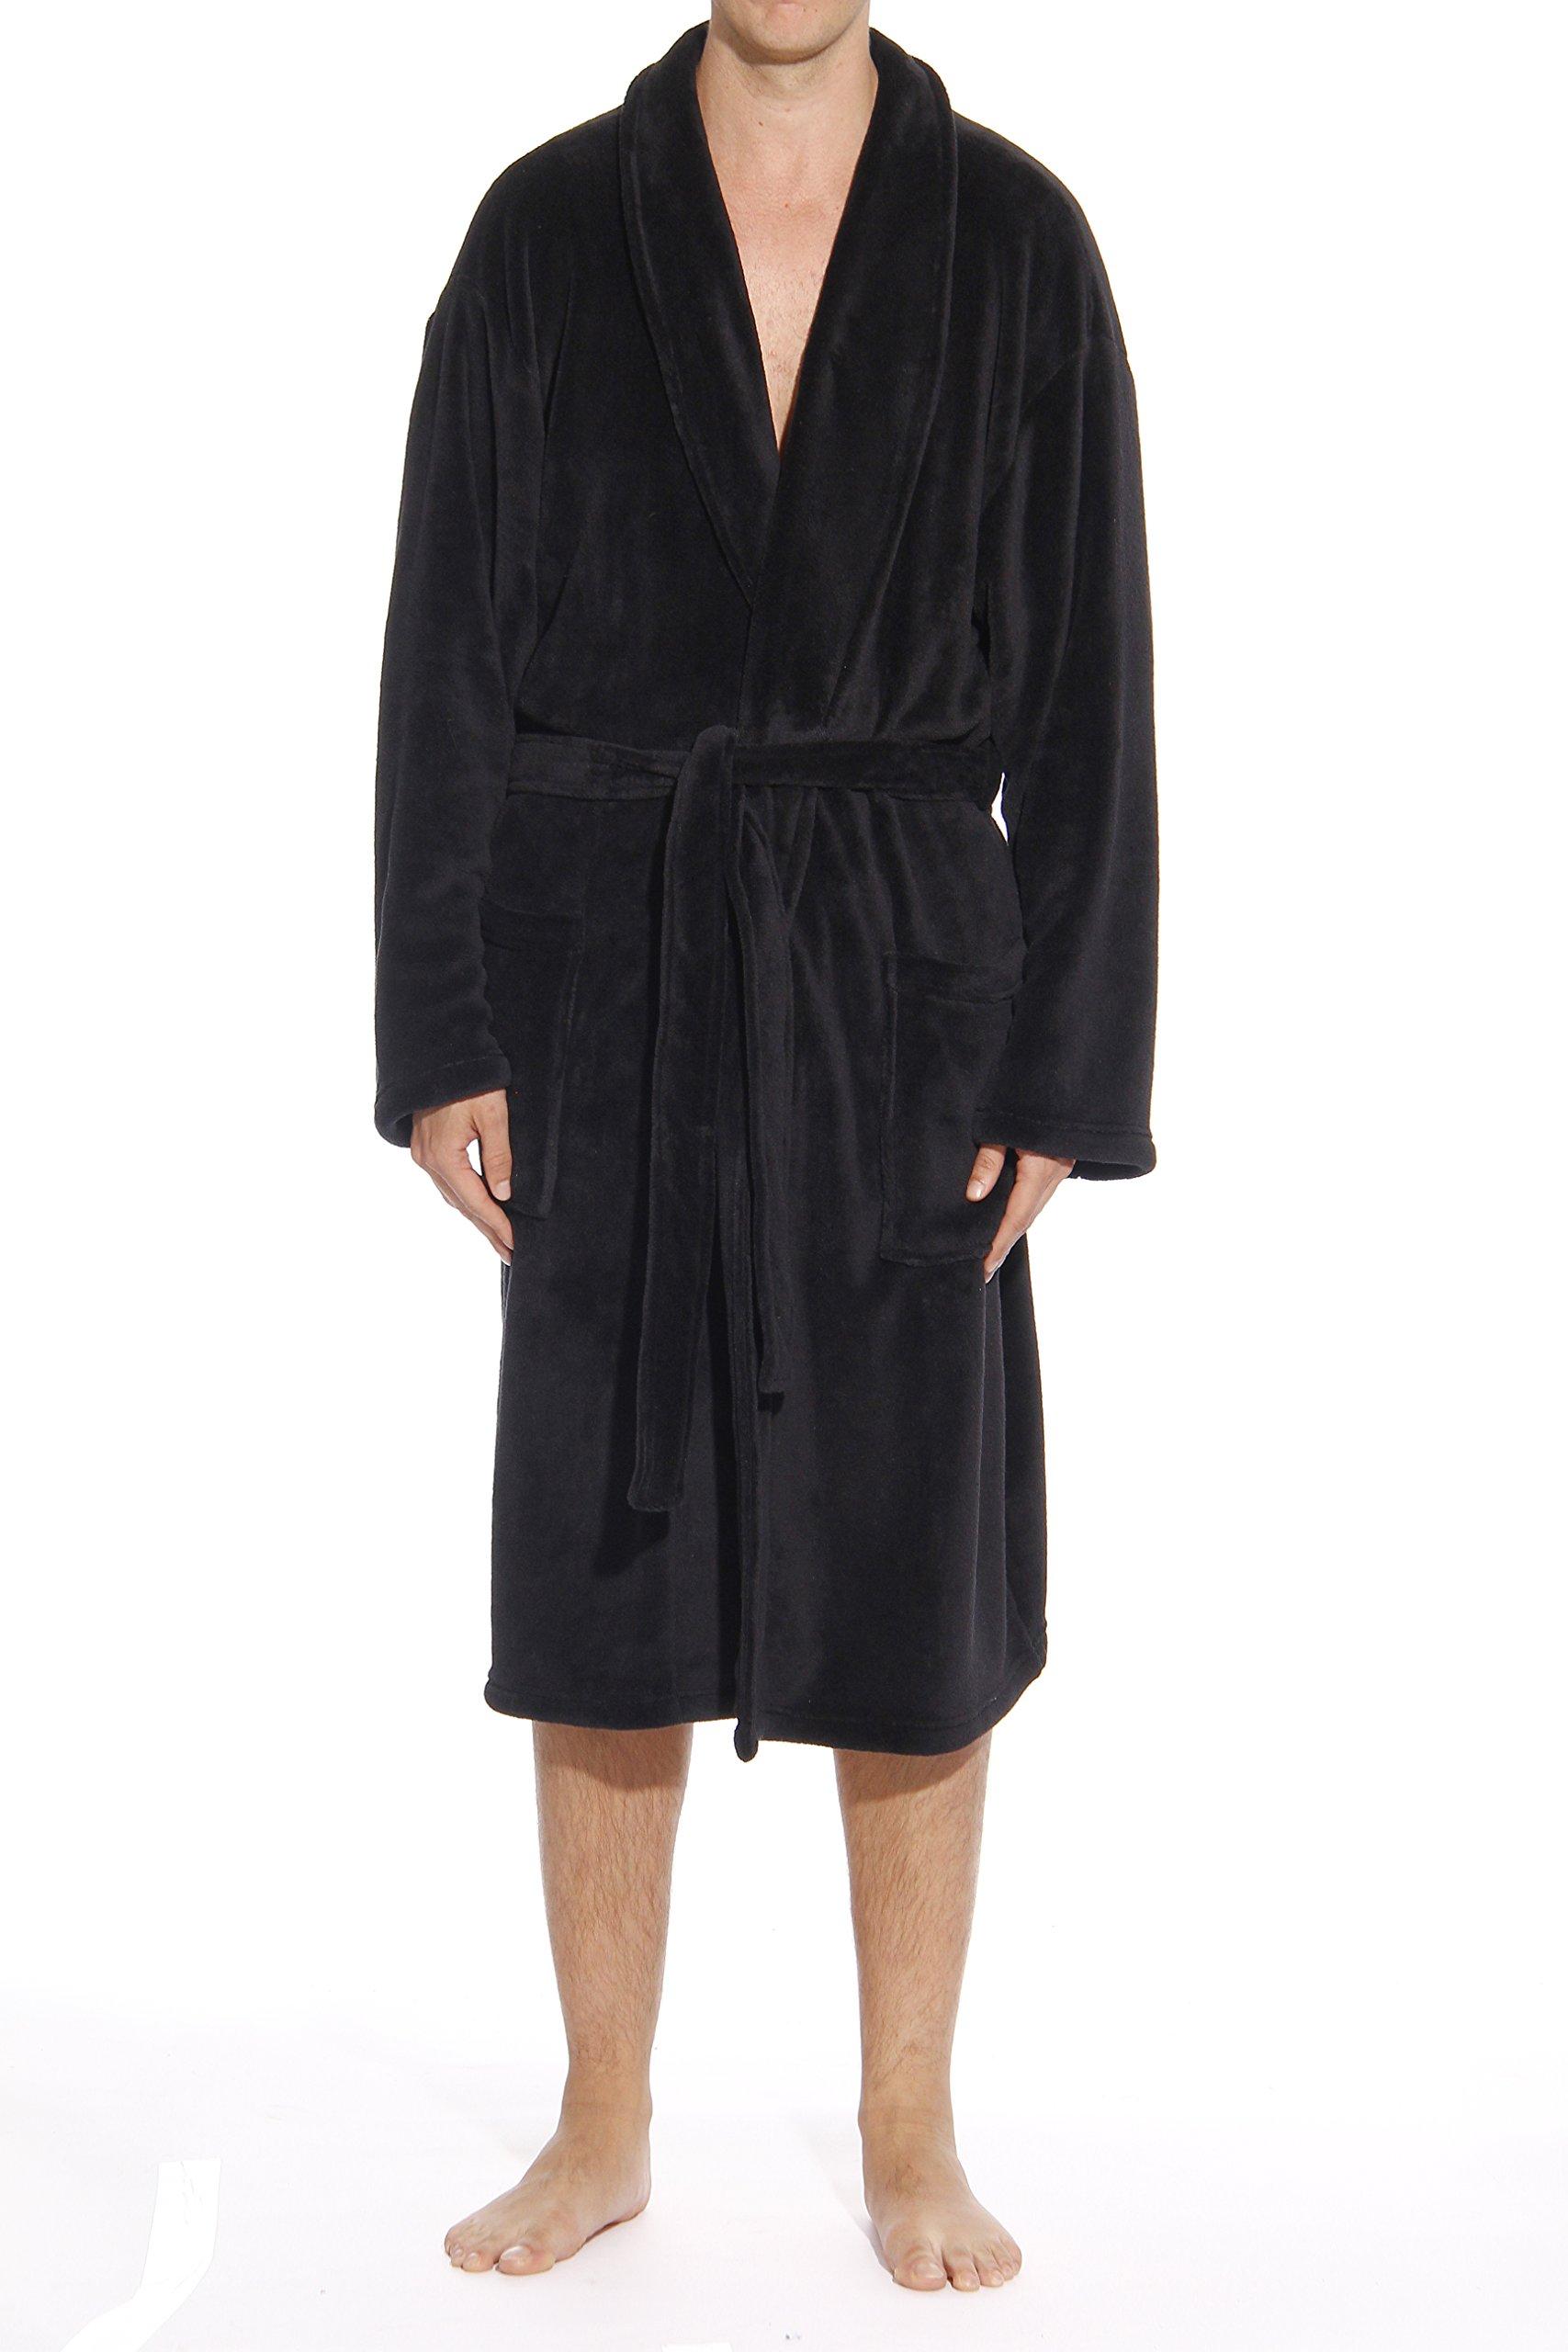 #followme 46902-BLK-M Plush Robe Robes For Men